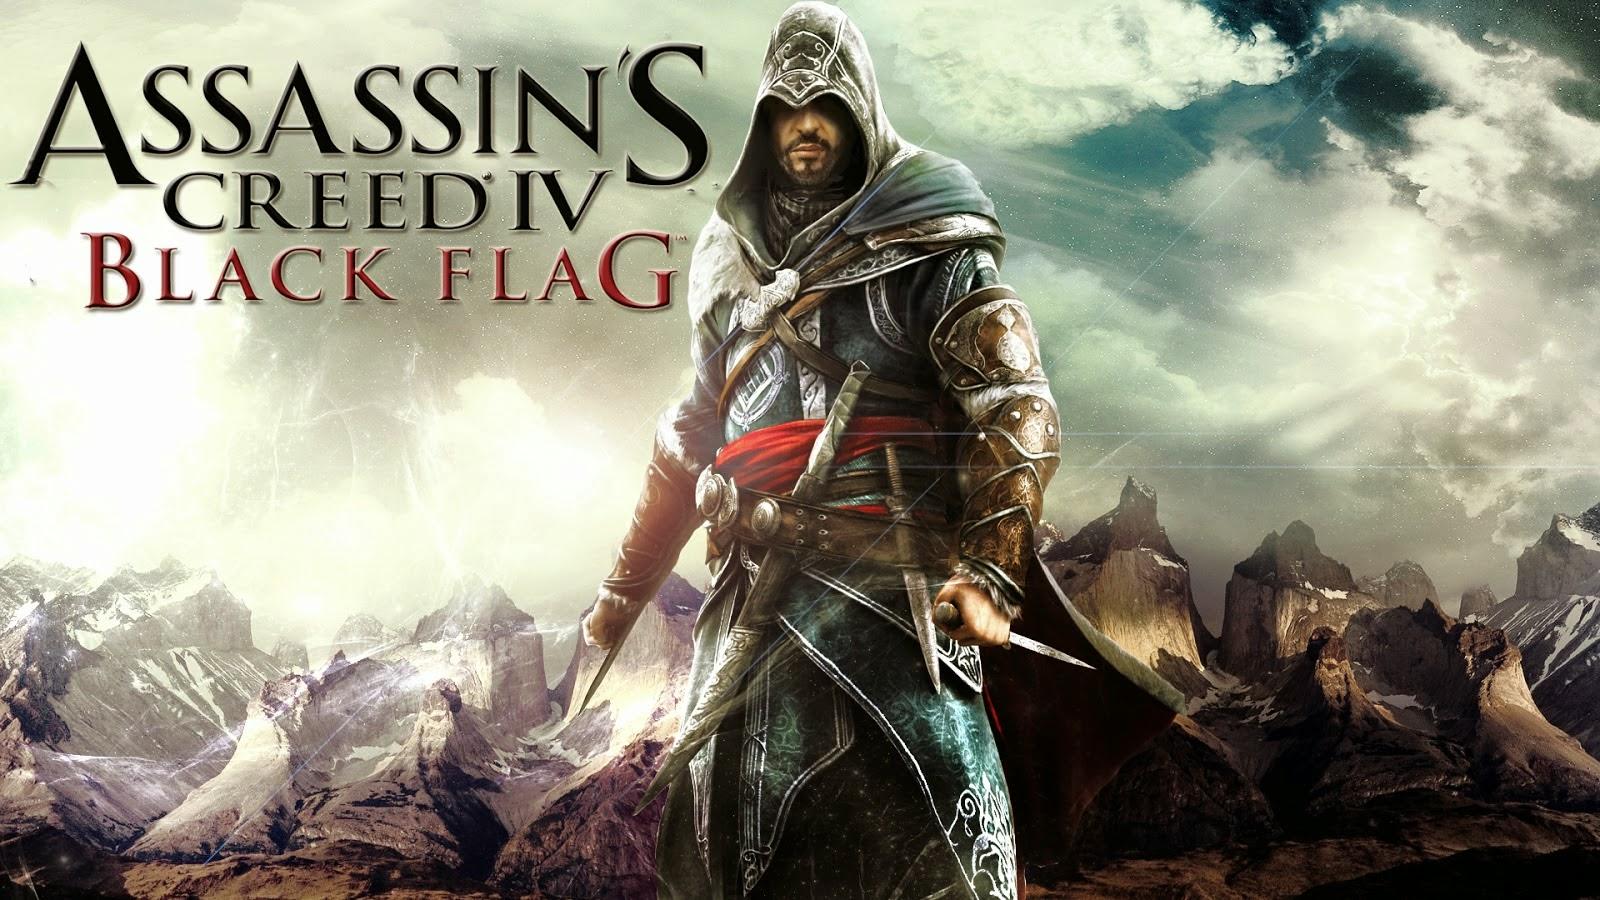 PkzGame แจกเกมส์ฟรีไฟล์เล็ก ไฟล์ใหญ่: ASSASSIN'S CREED IV BLACK FLAG [Repack] One2up